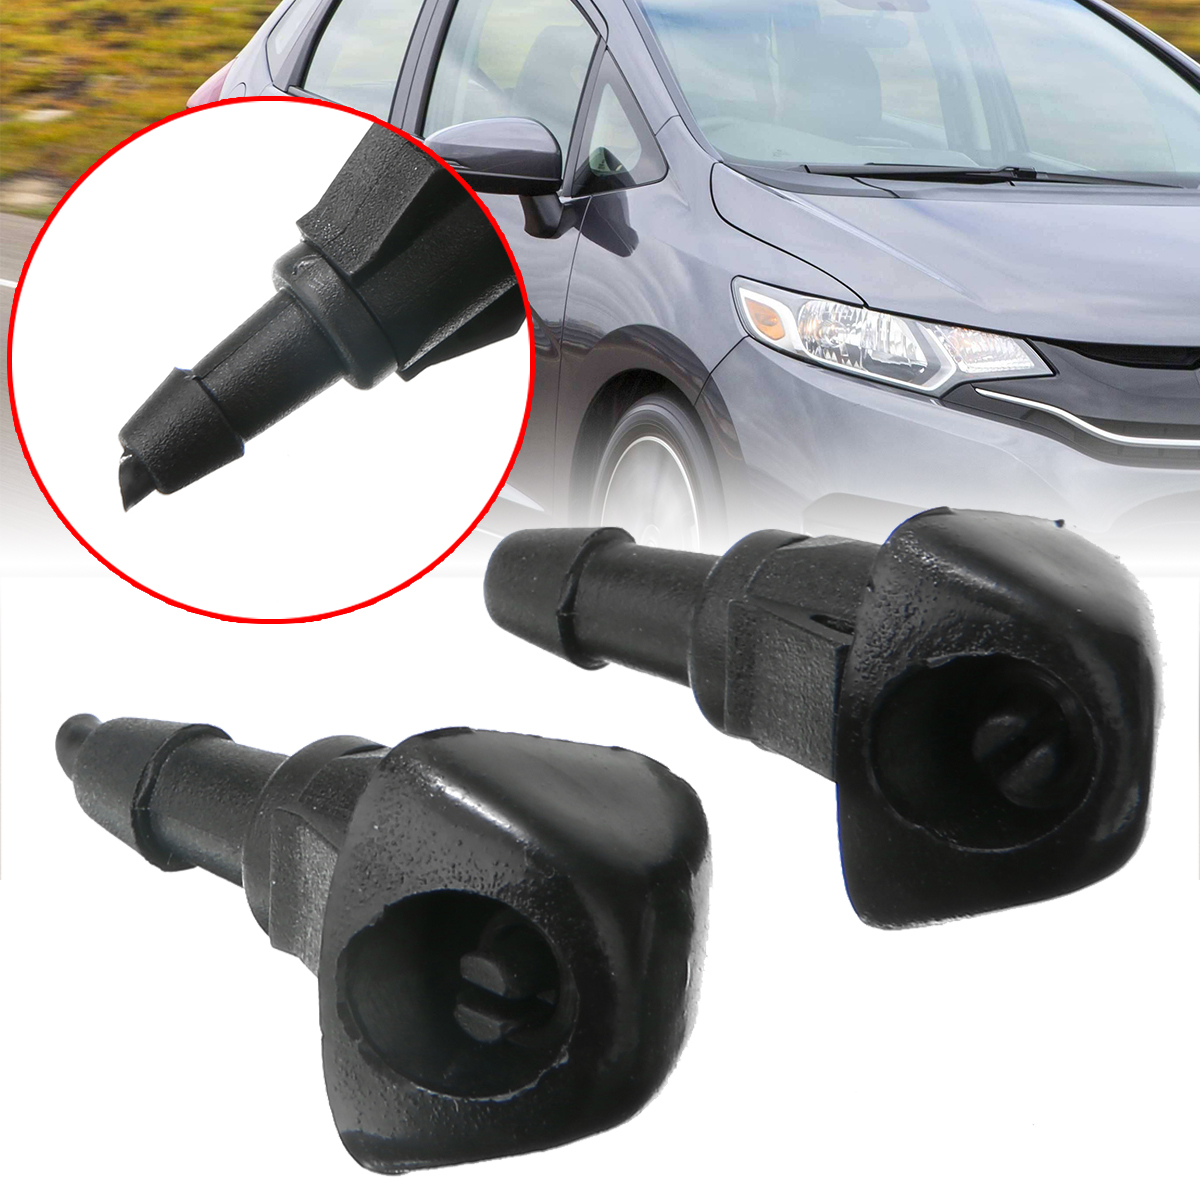 2pcs/set Car Glass Window Front Windscreen Washer Jet Spray Nozzle Jet Fit For Honda Accord Civic VII Jazz HRV CRV